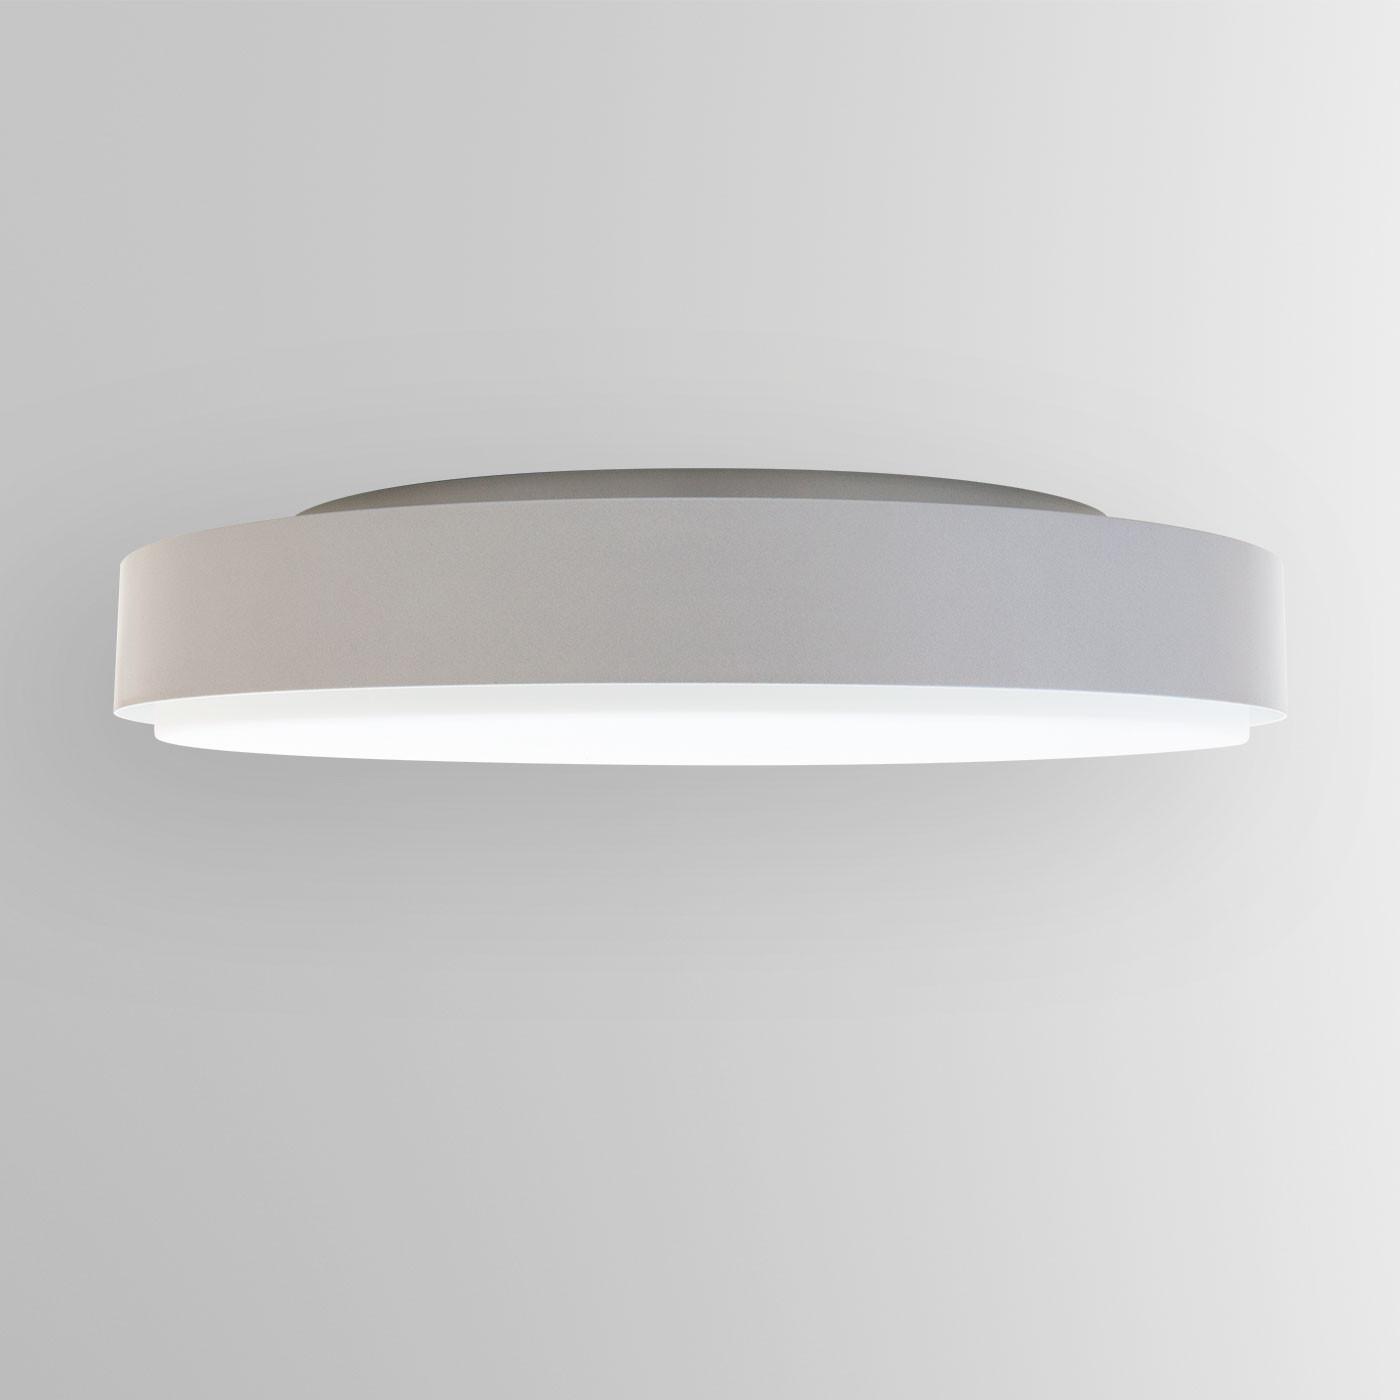 Bega 12165 LED Wand-/Deckenleuchte